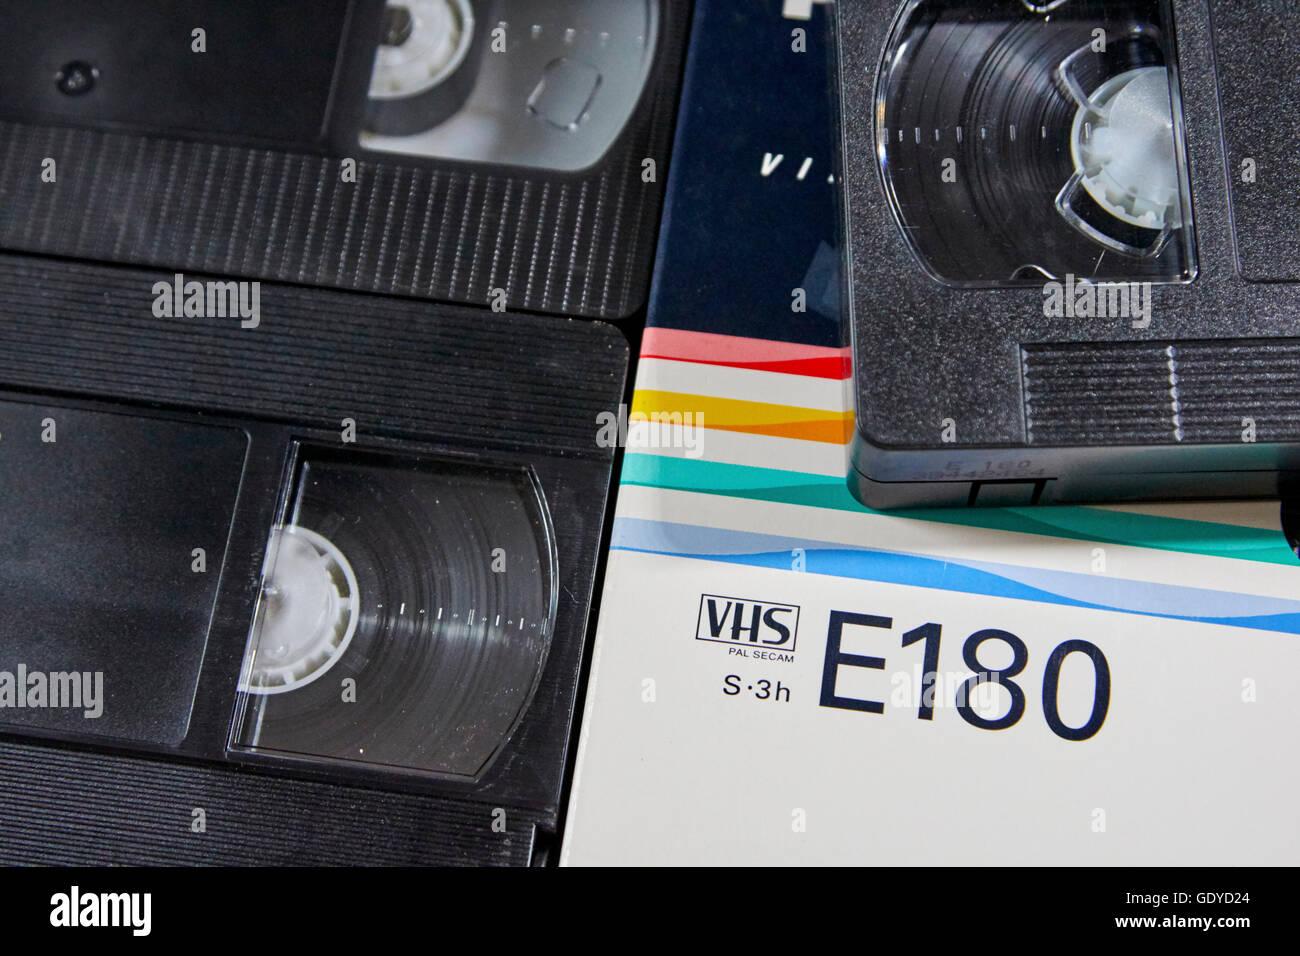 philips e180 VHS blank cassette tapes - Stock Image